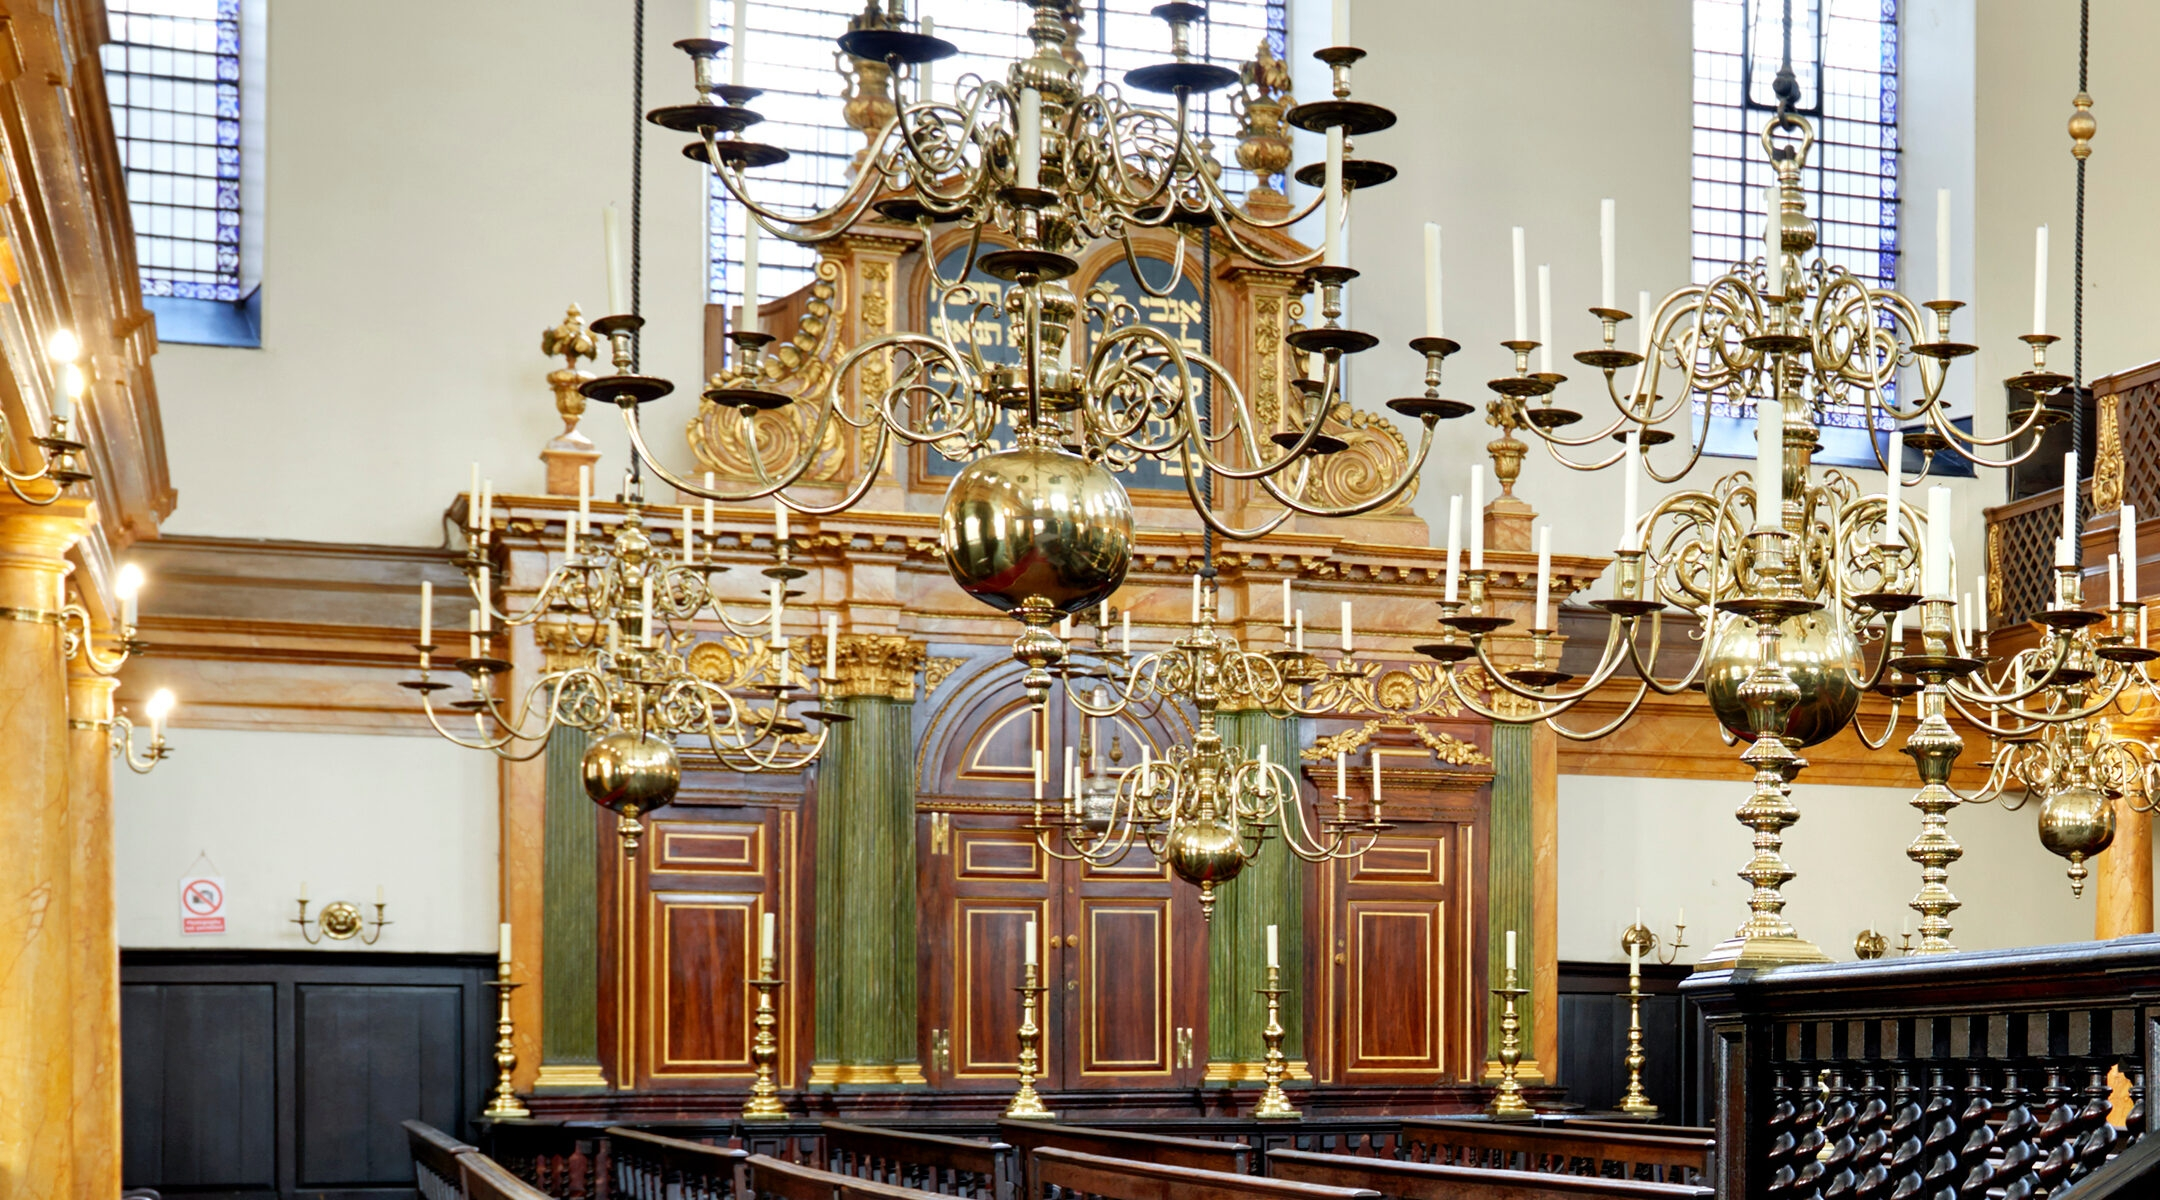 A chandelier at Bevis Marks synagogue in London, UK. (Peter Dazeley/Getty Images)